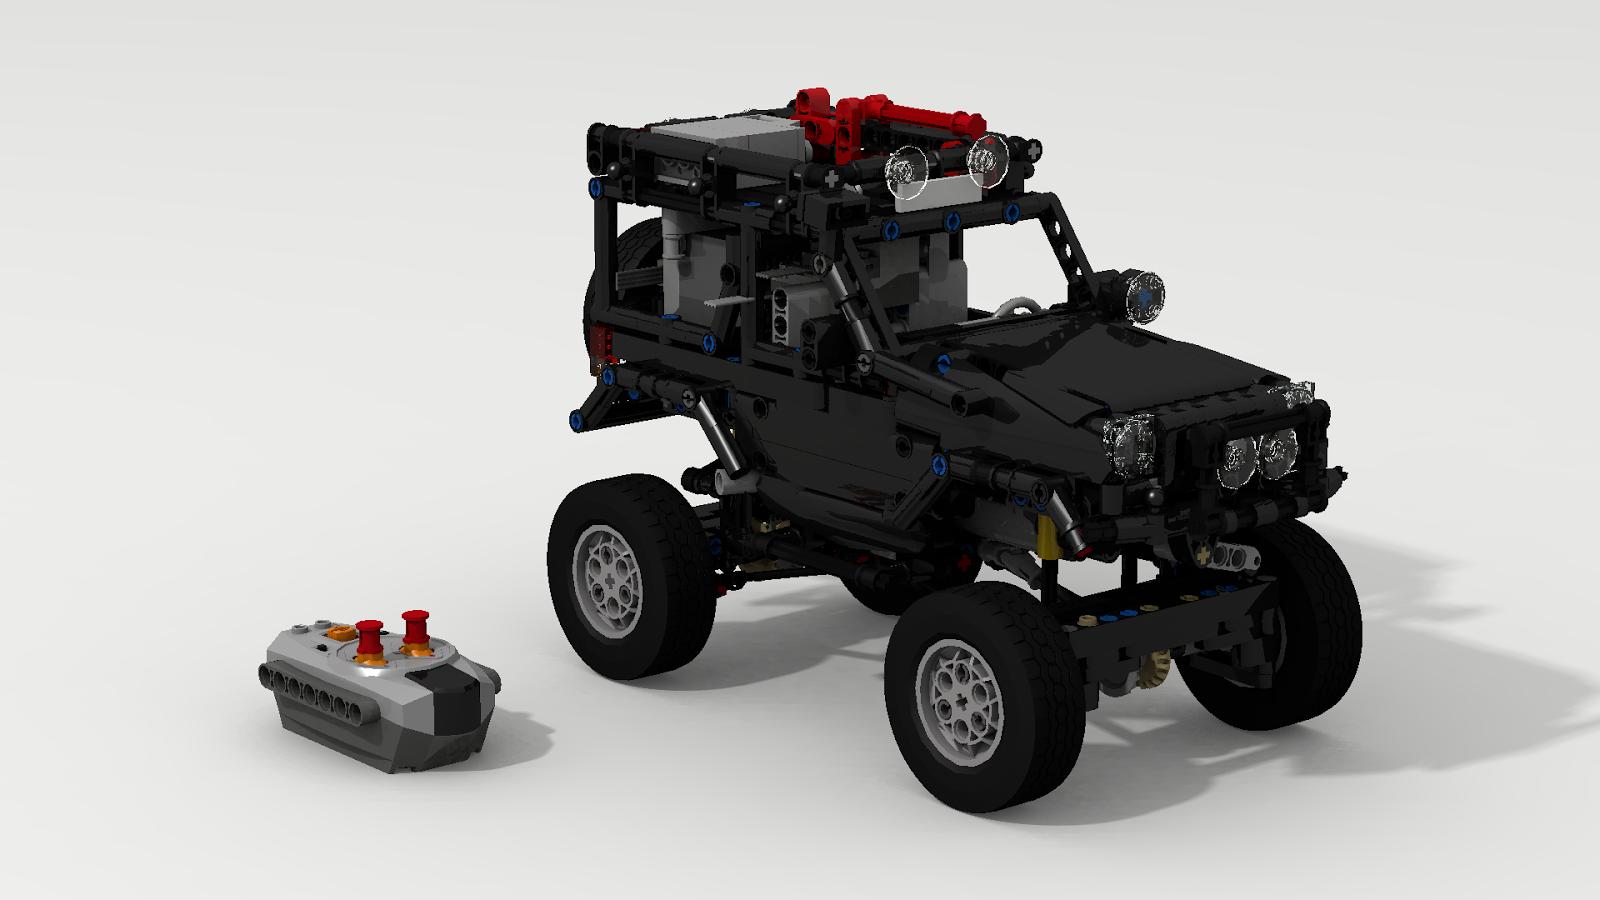 Filsawgood Lego Technic Creations Lego Technic Suzuki